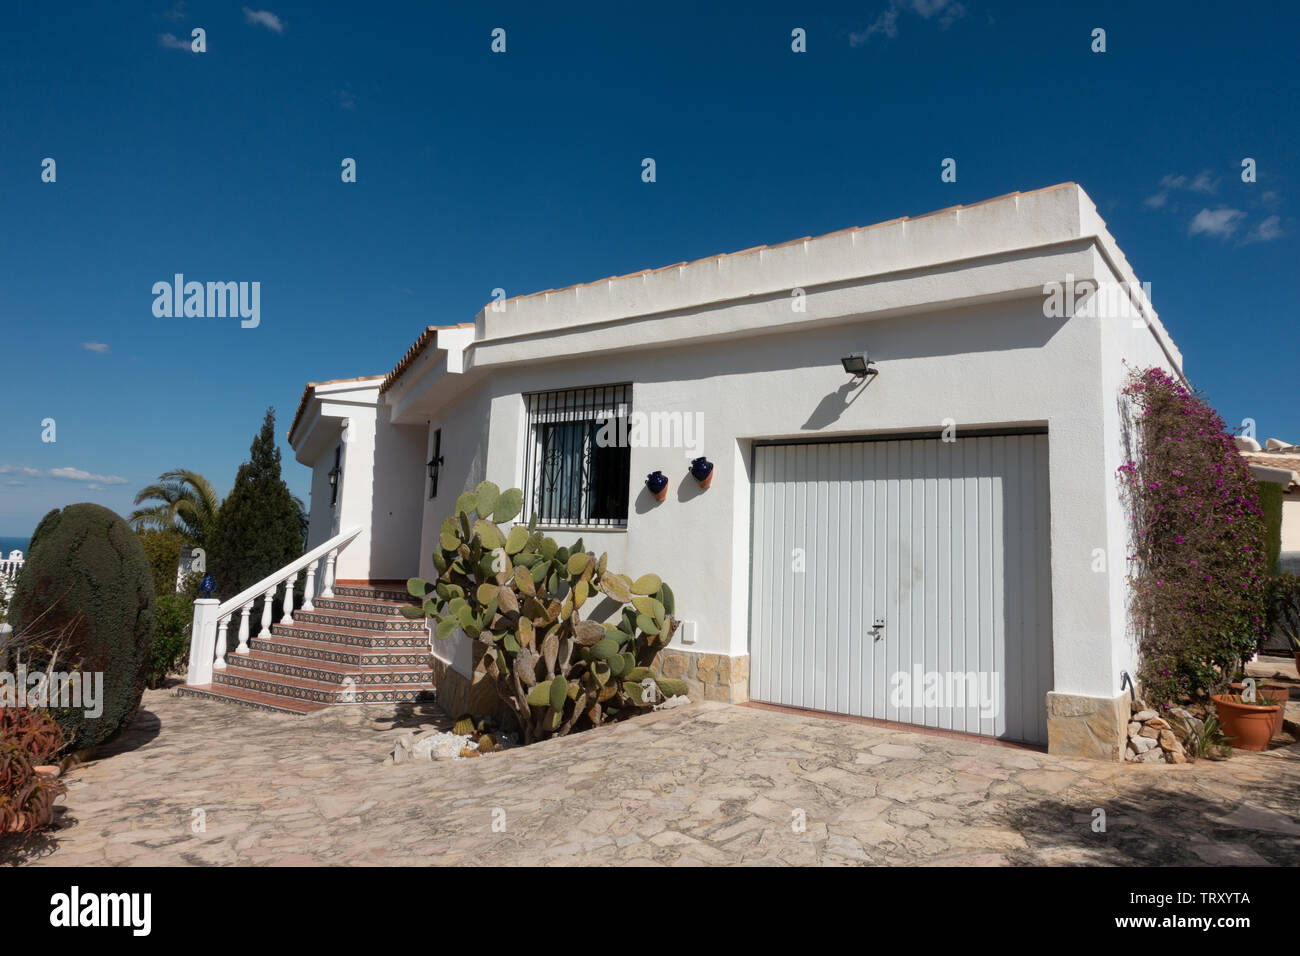 Spanish villa against a blue sky - Stock Image